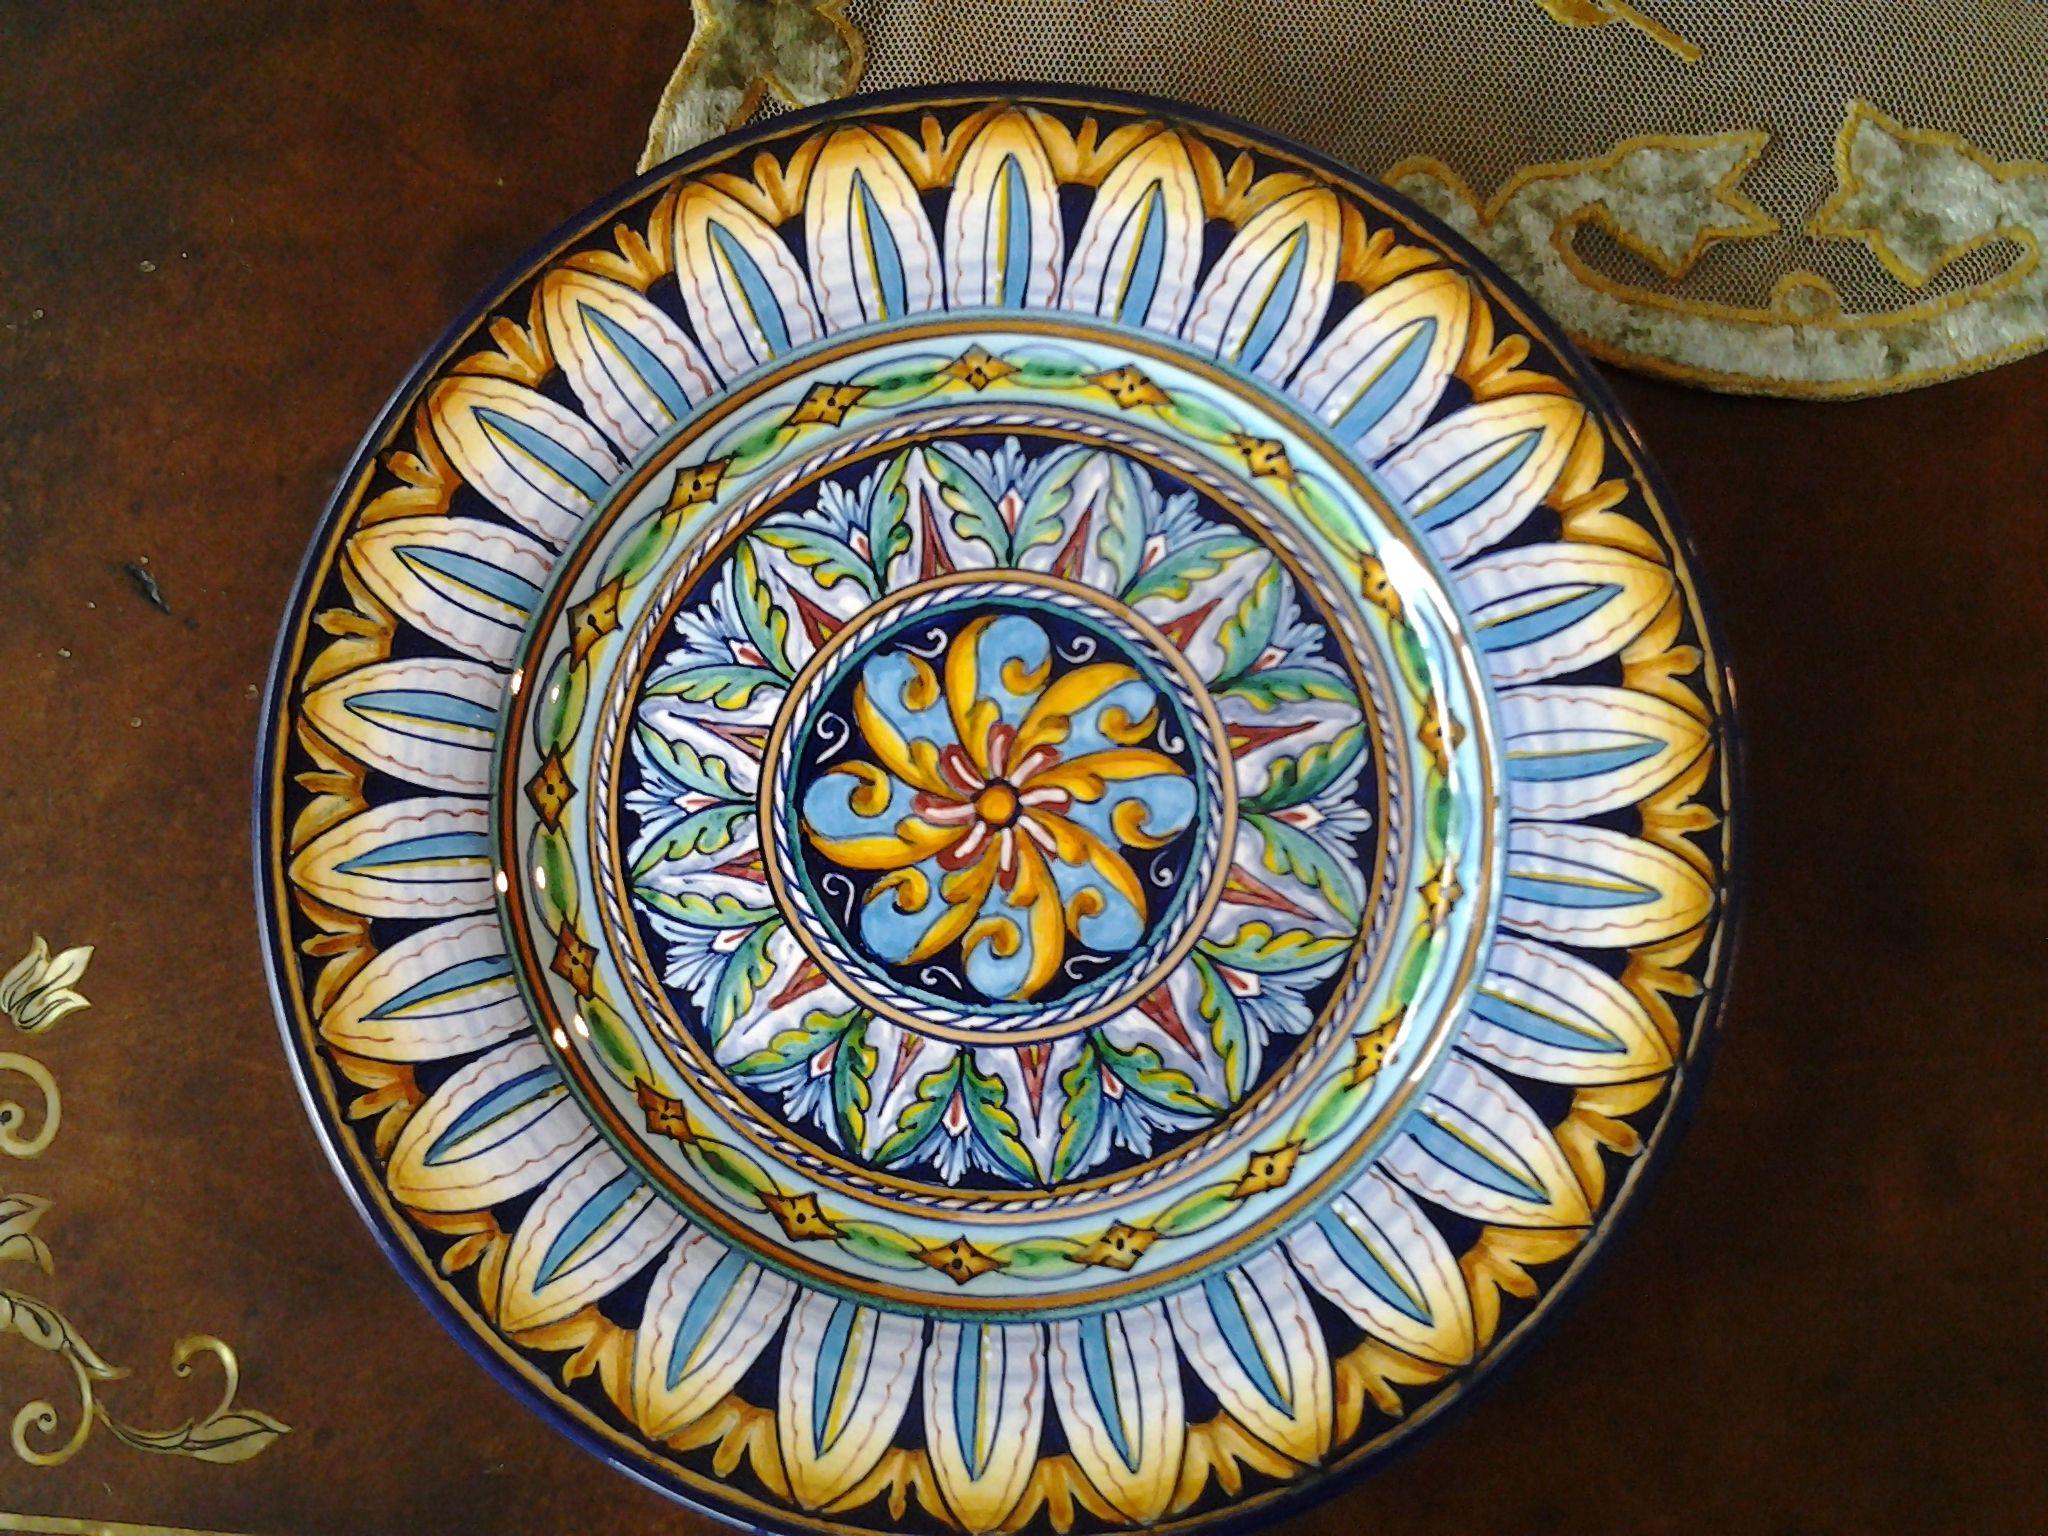 Magnificent Dinnerware By Fima Artesanato Criatividade